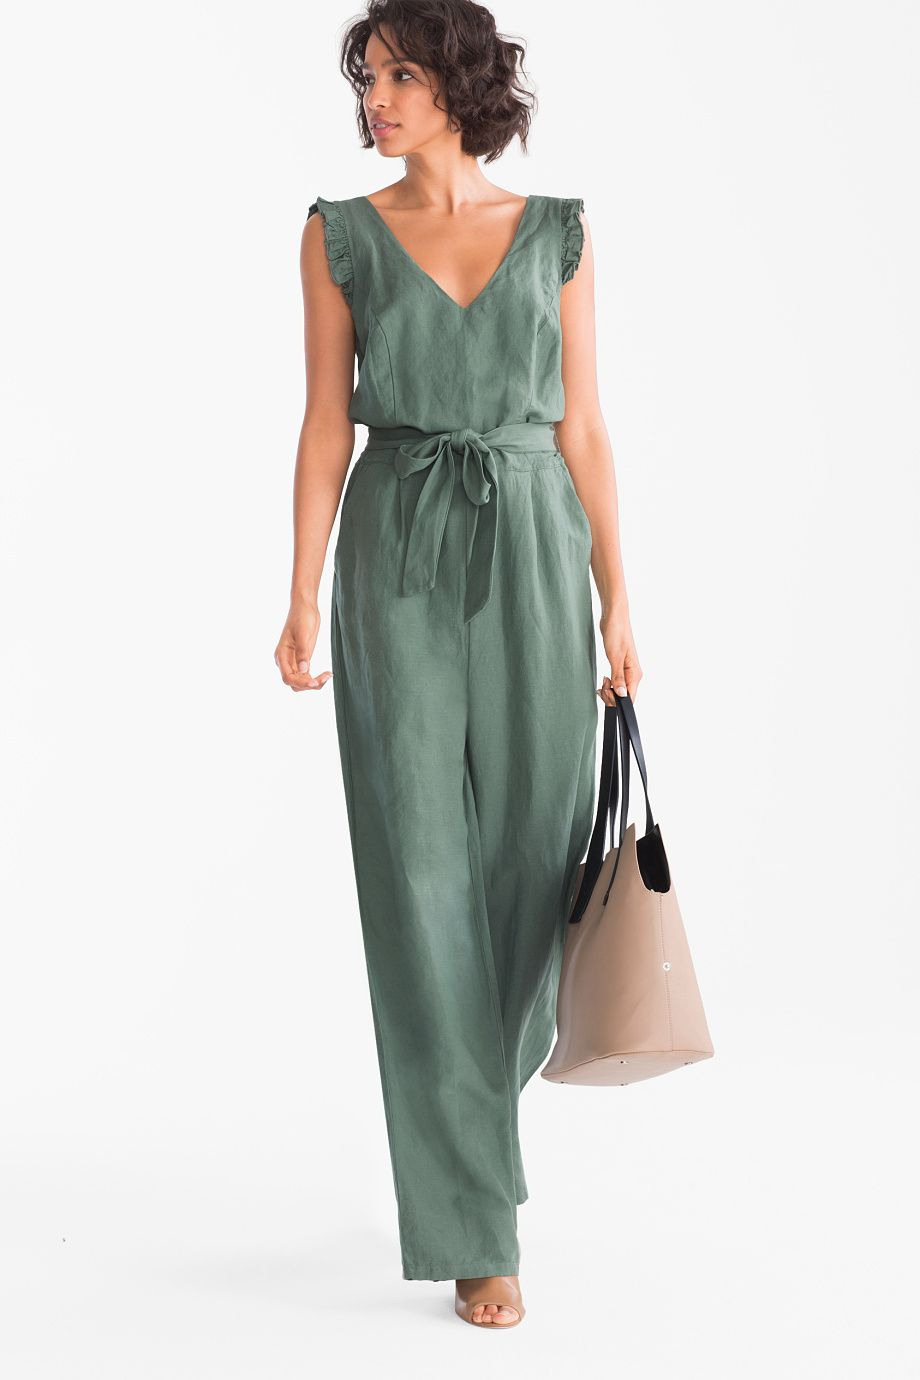 Perfekt Abendkleid Cunda Stylish17 Perfekt Abendkleid Cunda Vertrieb